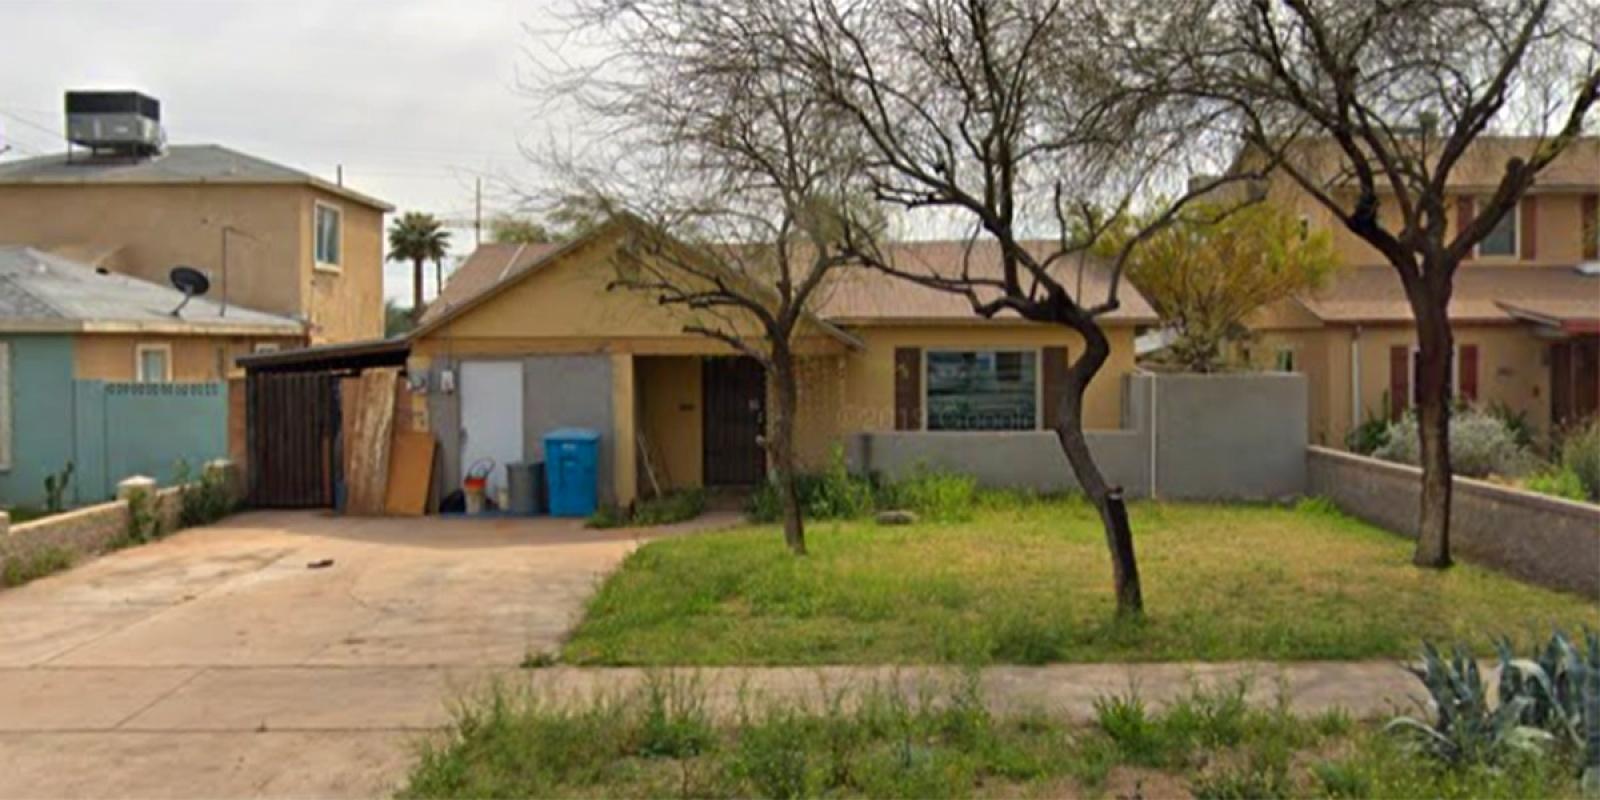 1441 E Palm Ln, Phoenix, Arizona 85006, 3 Bedrooms Bedrooms, ,1 BathroomBathrooms,SFR,Available,E Palm Ln,1178